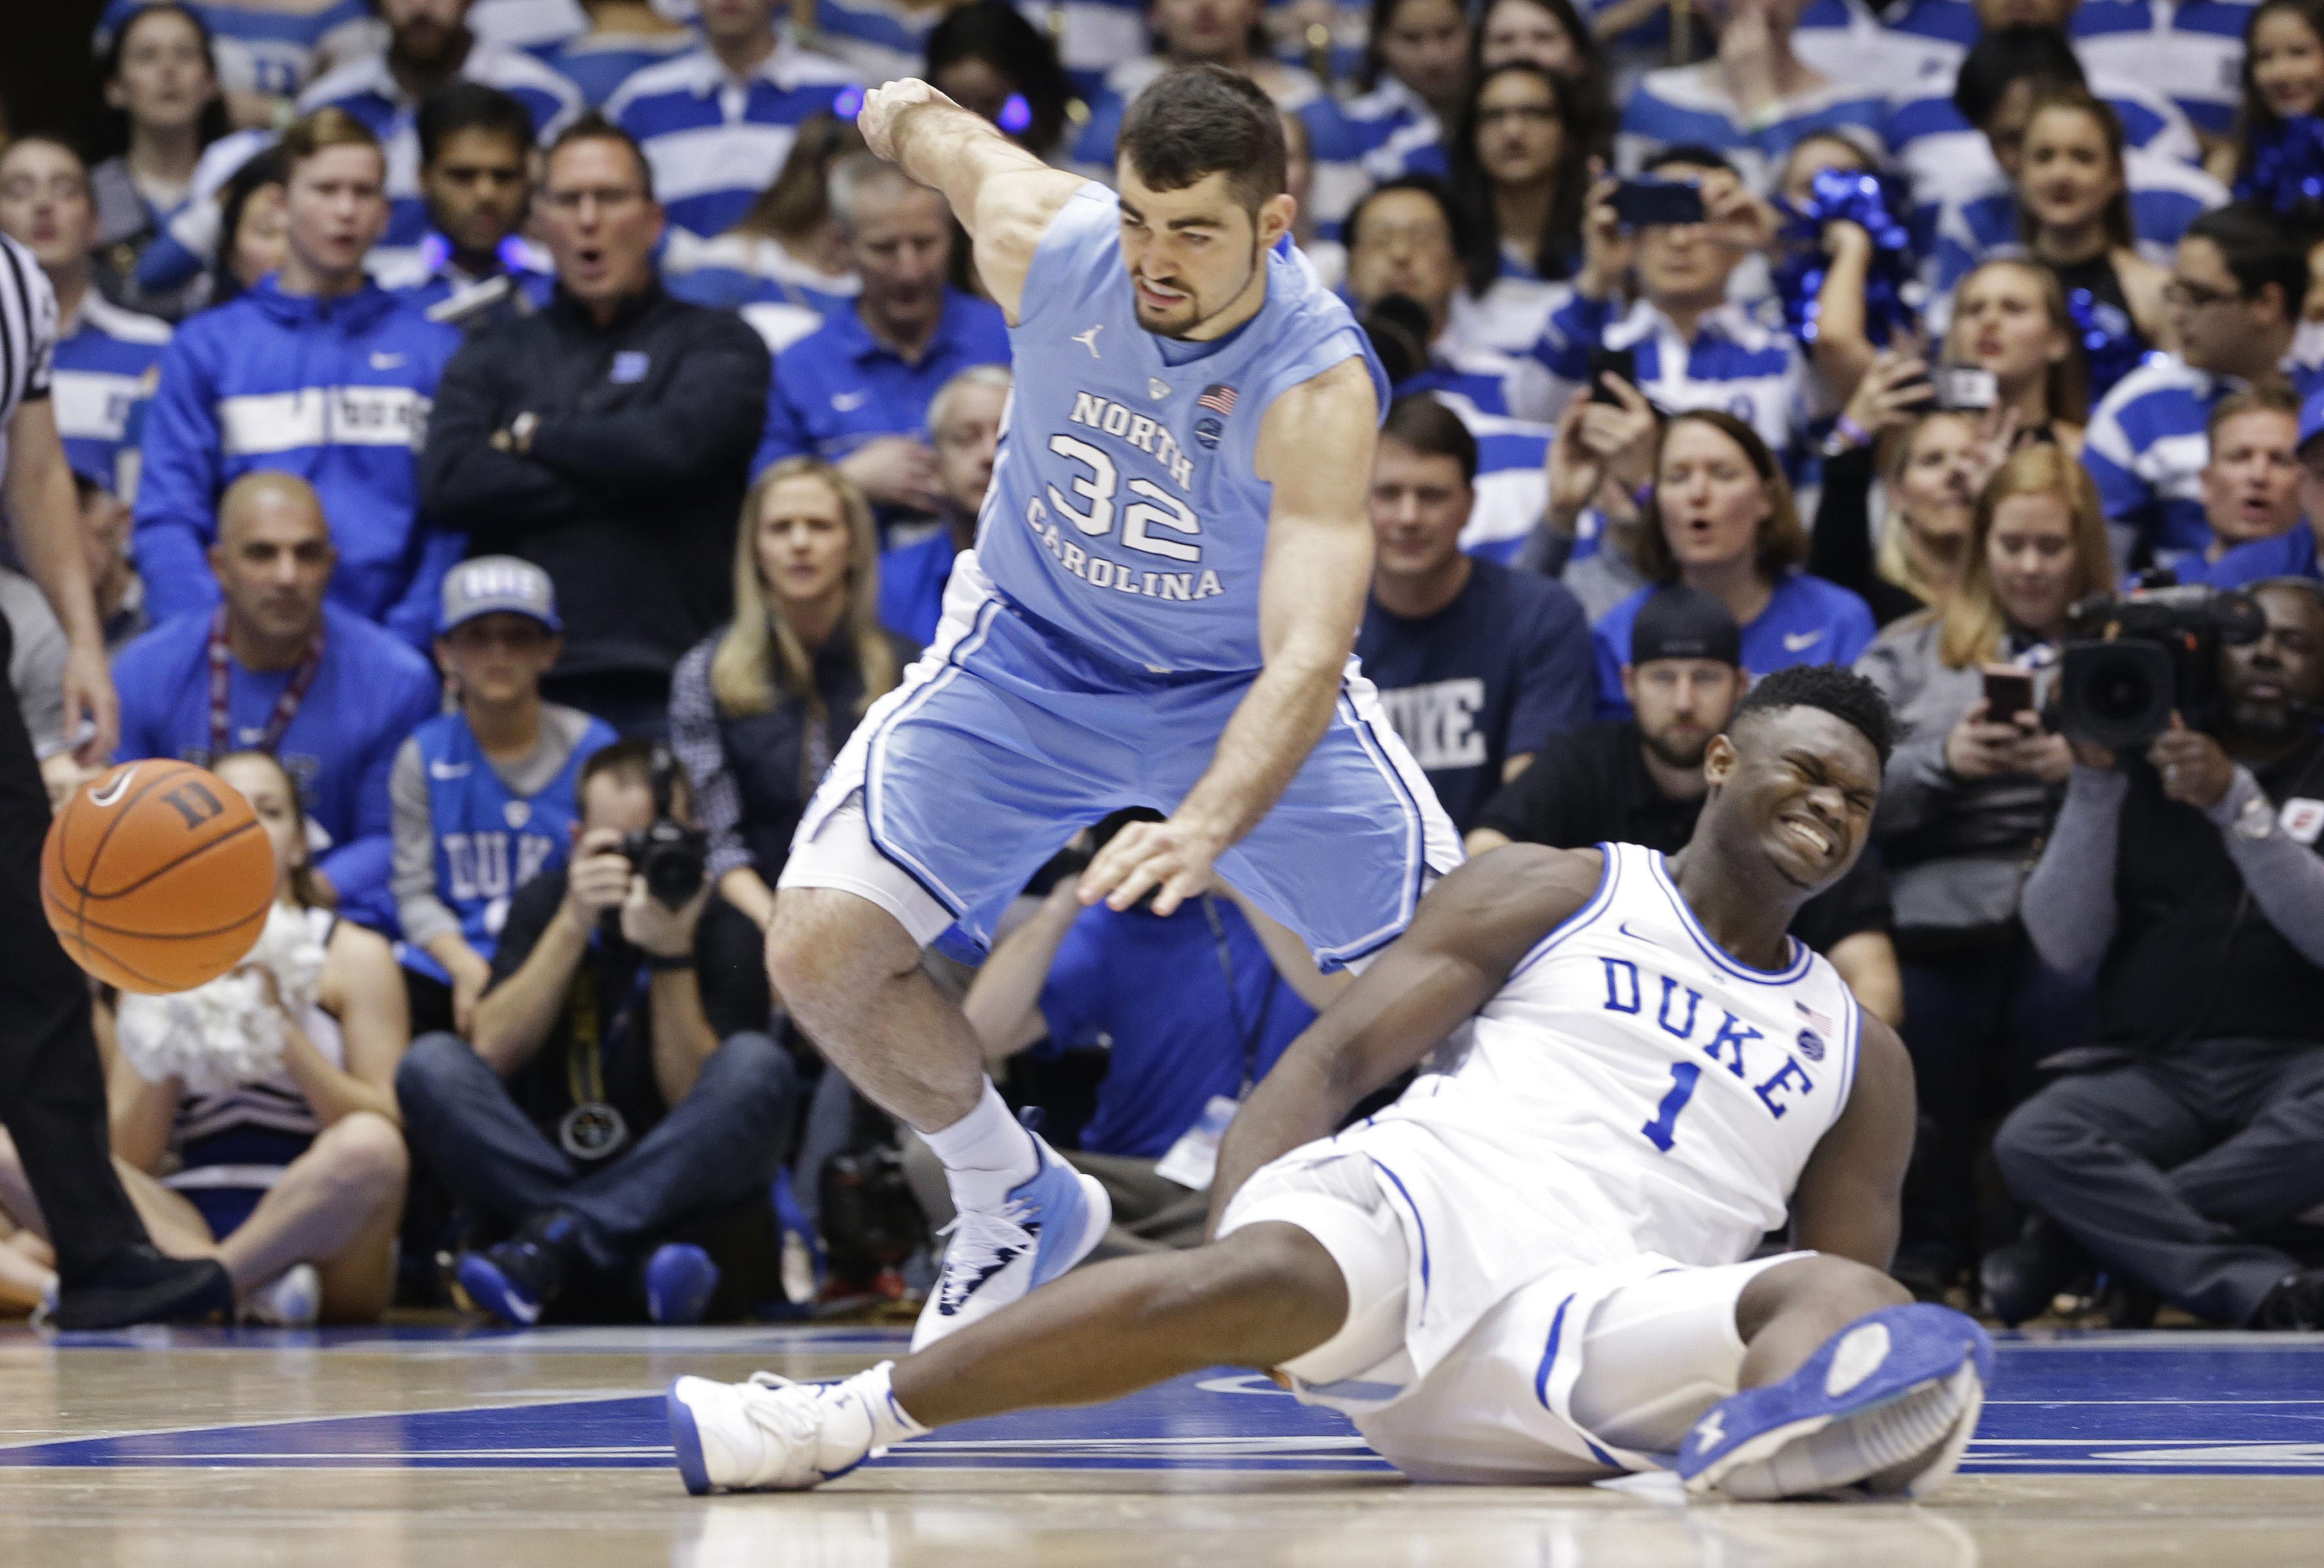 8afa34c2e45fd9 Duke star Williamson sprains knee after Nike shoe blows out ...